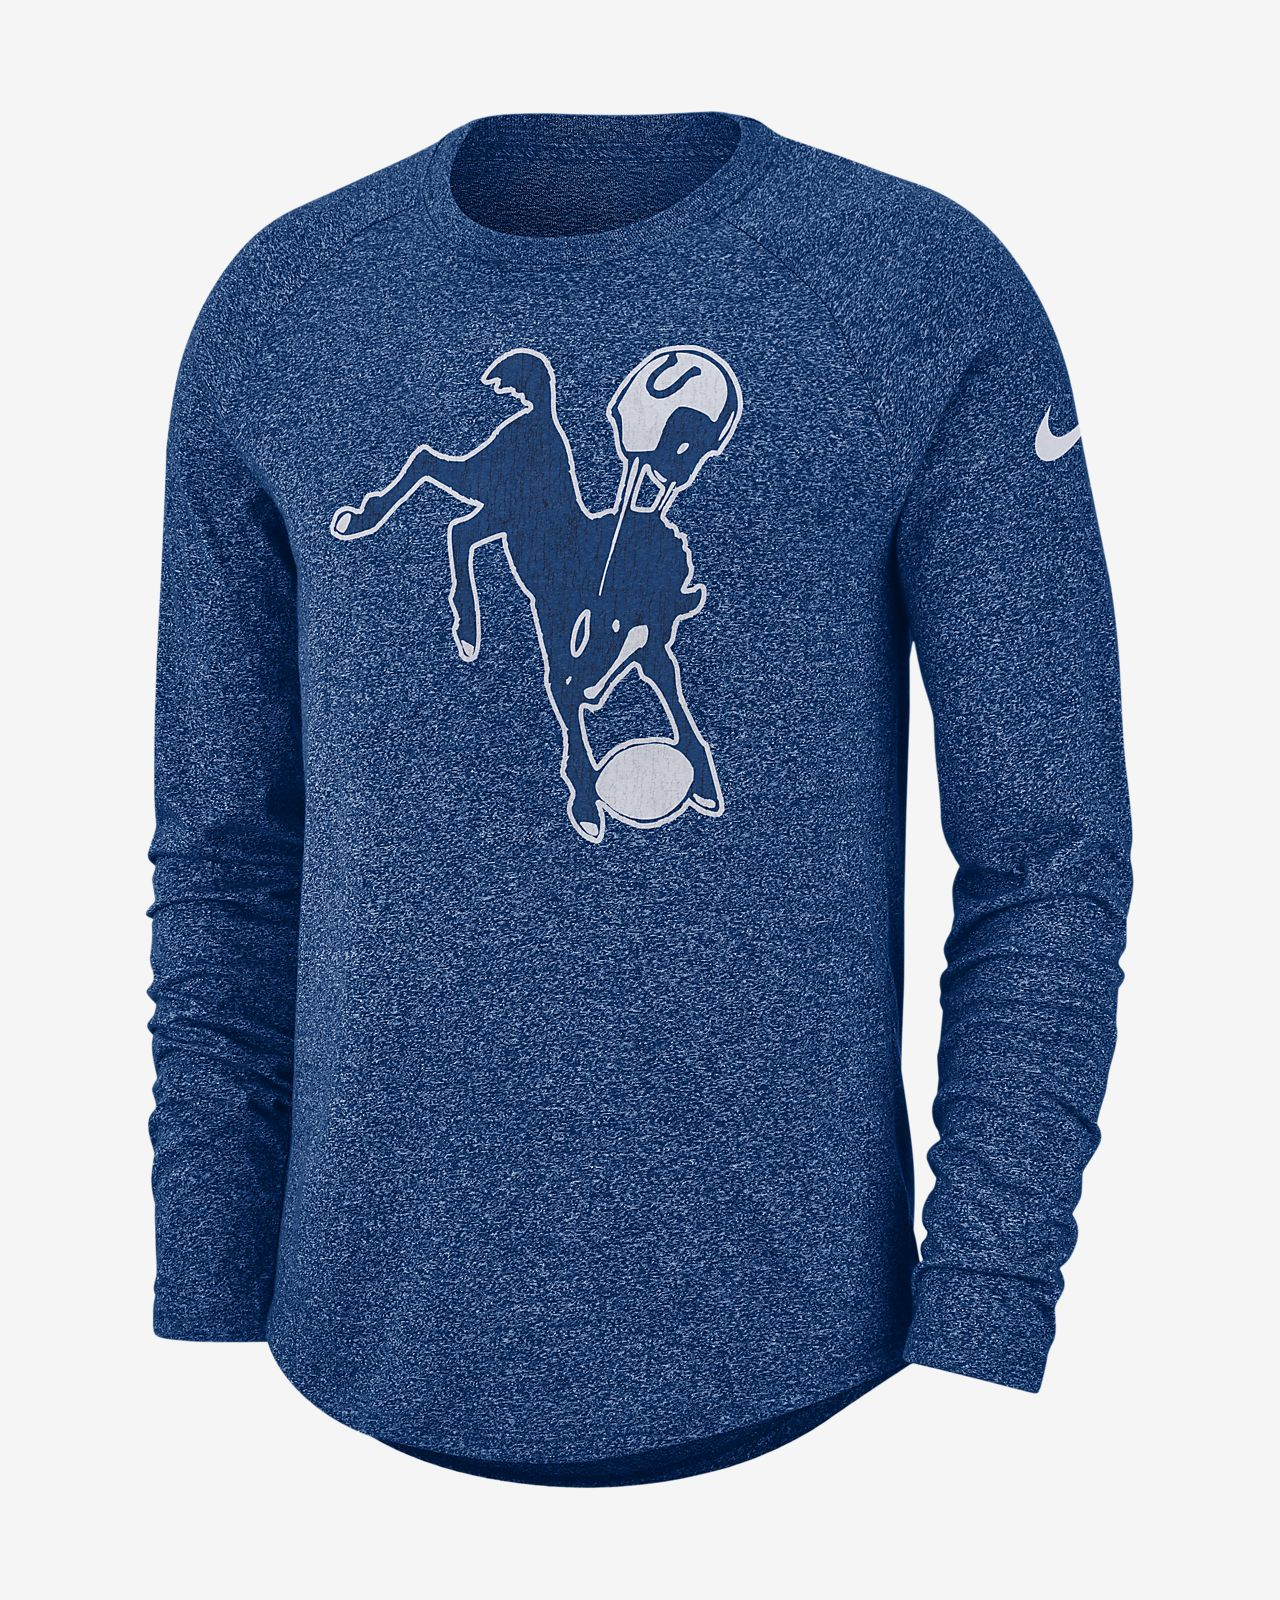 Nike Historic (NFL Colts) Men's Long-Sleeve T-Shirt